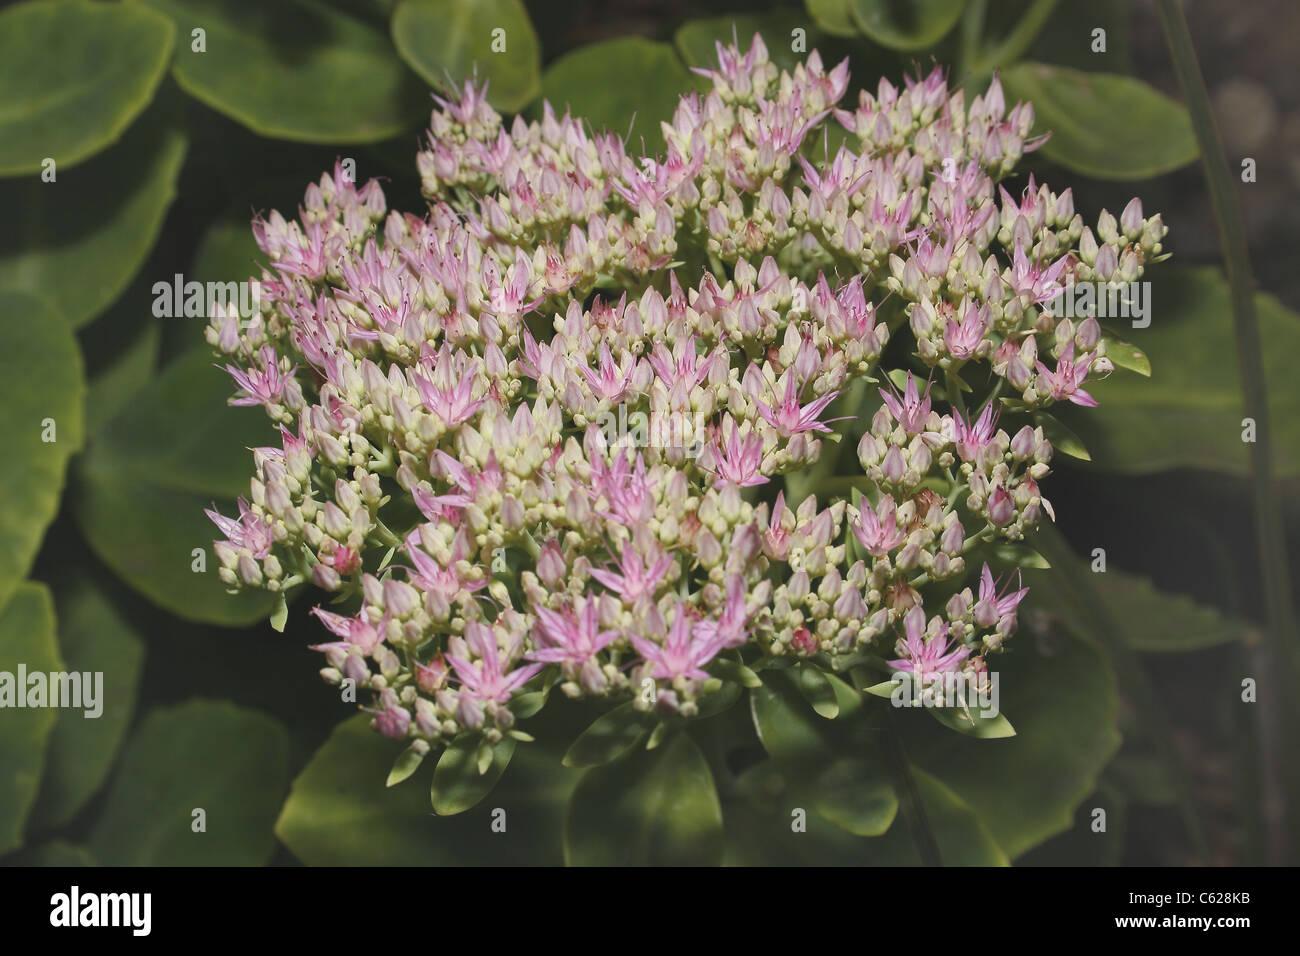 image of Showy Stonecrop flowers Sedum spectabile - Stock Image